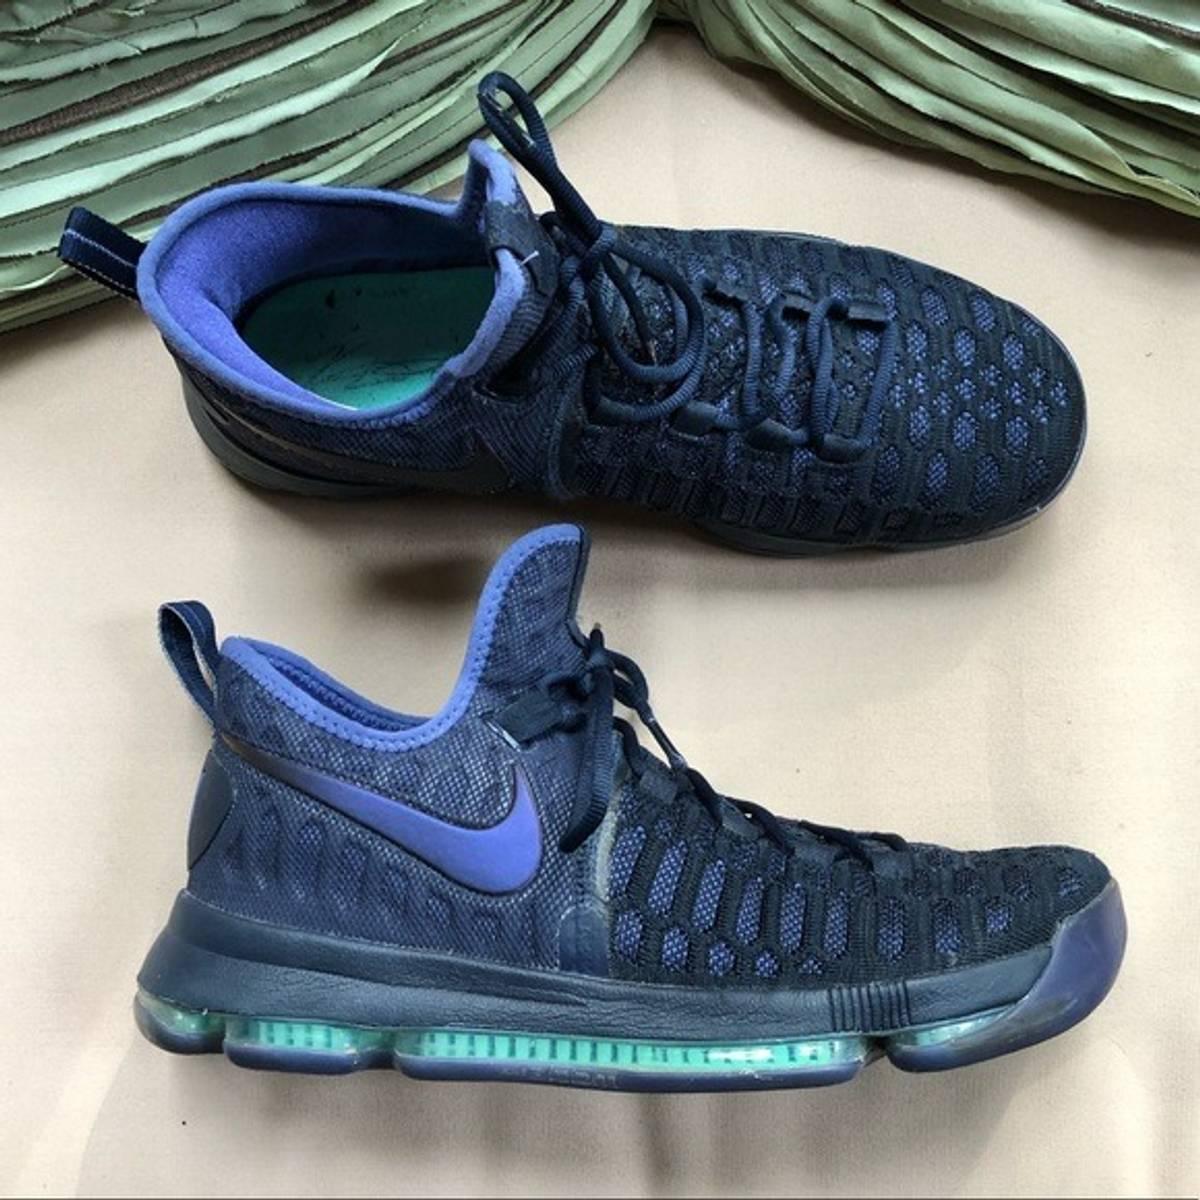 Goteo Monumental manguera  Nike Nike Kd 9 Dark Purple Dust Sneakers Size 11 | Grailed